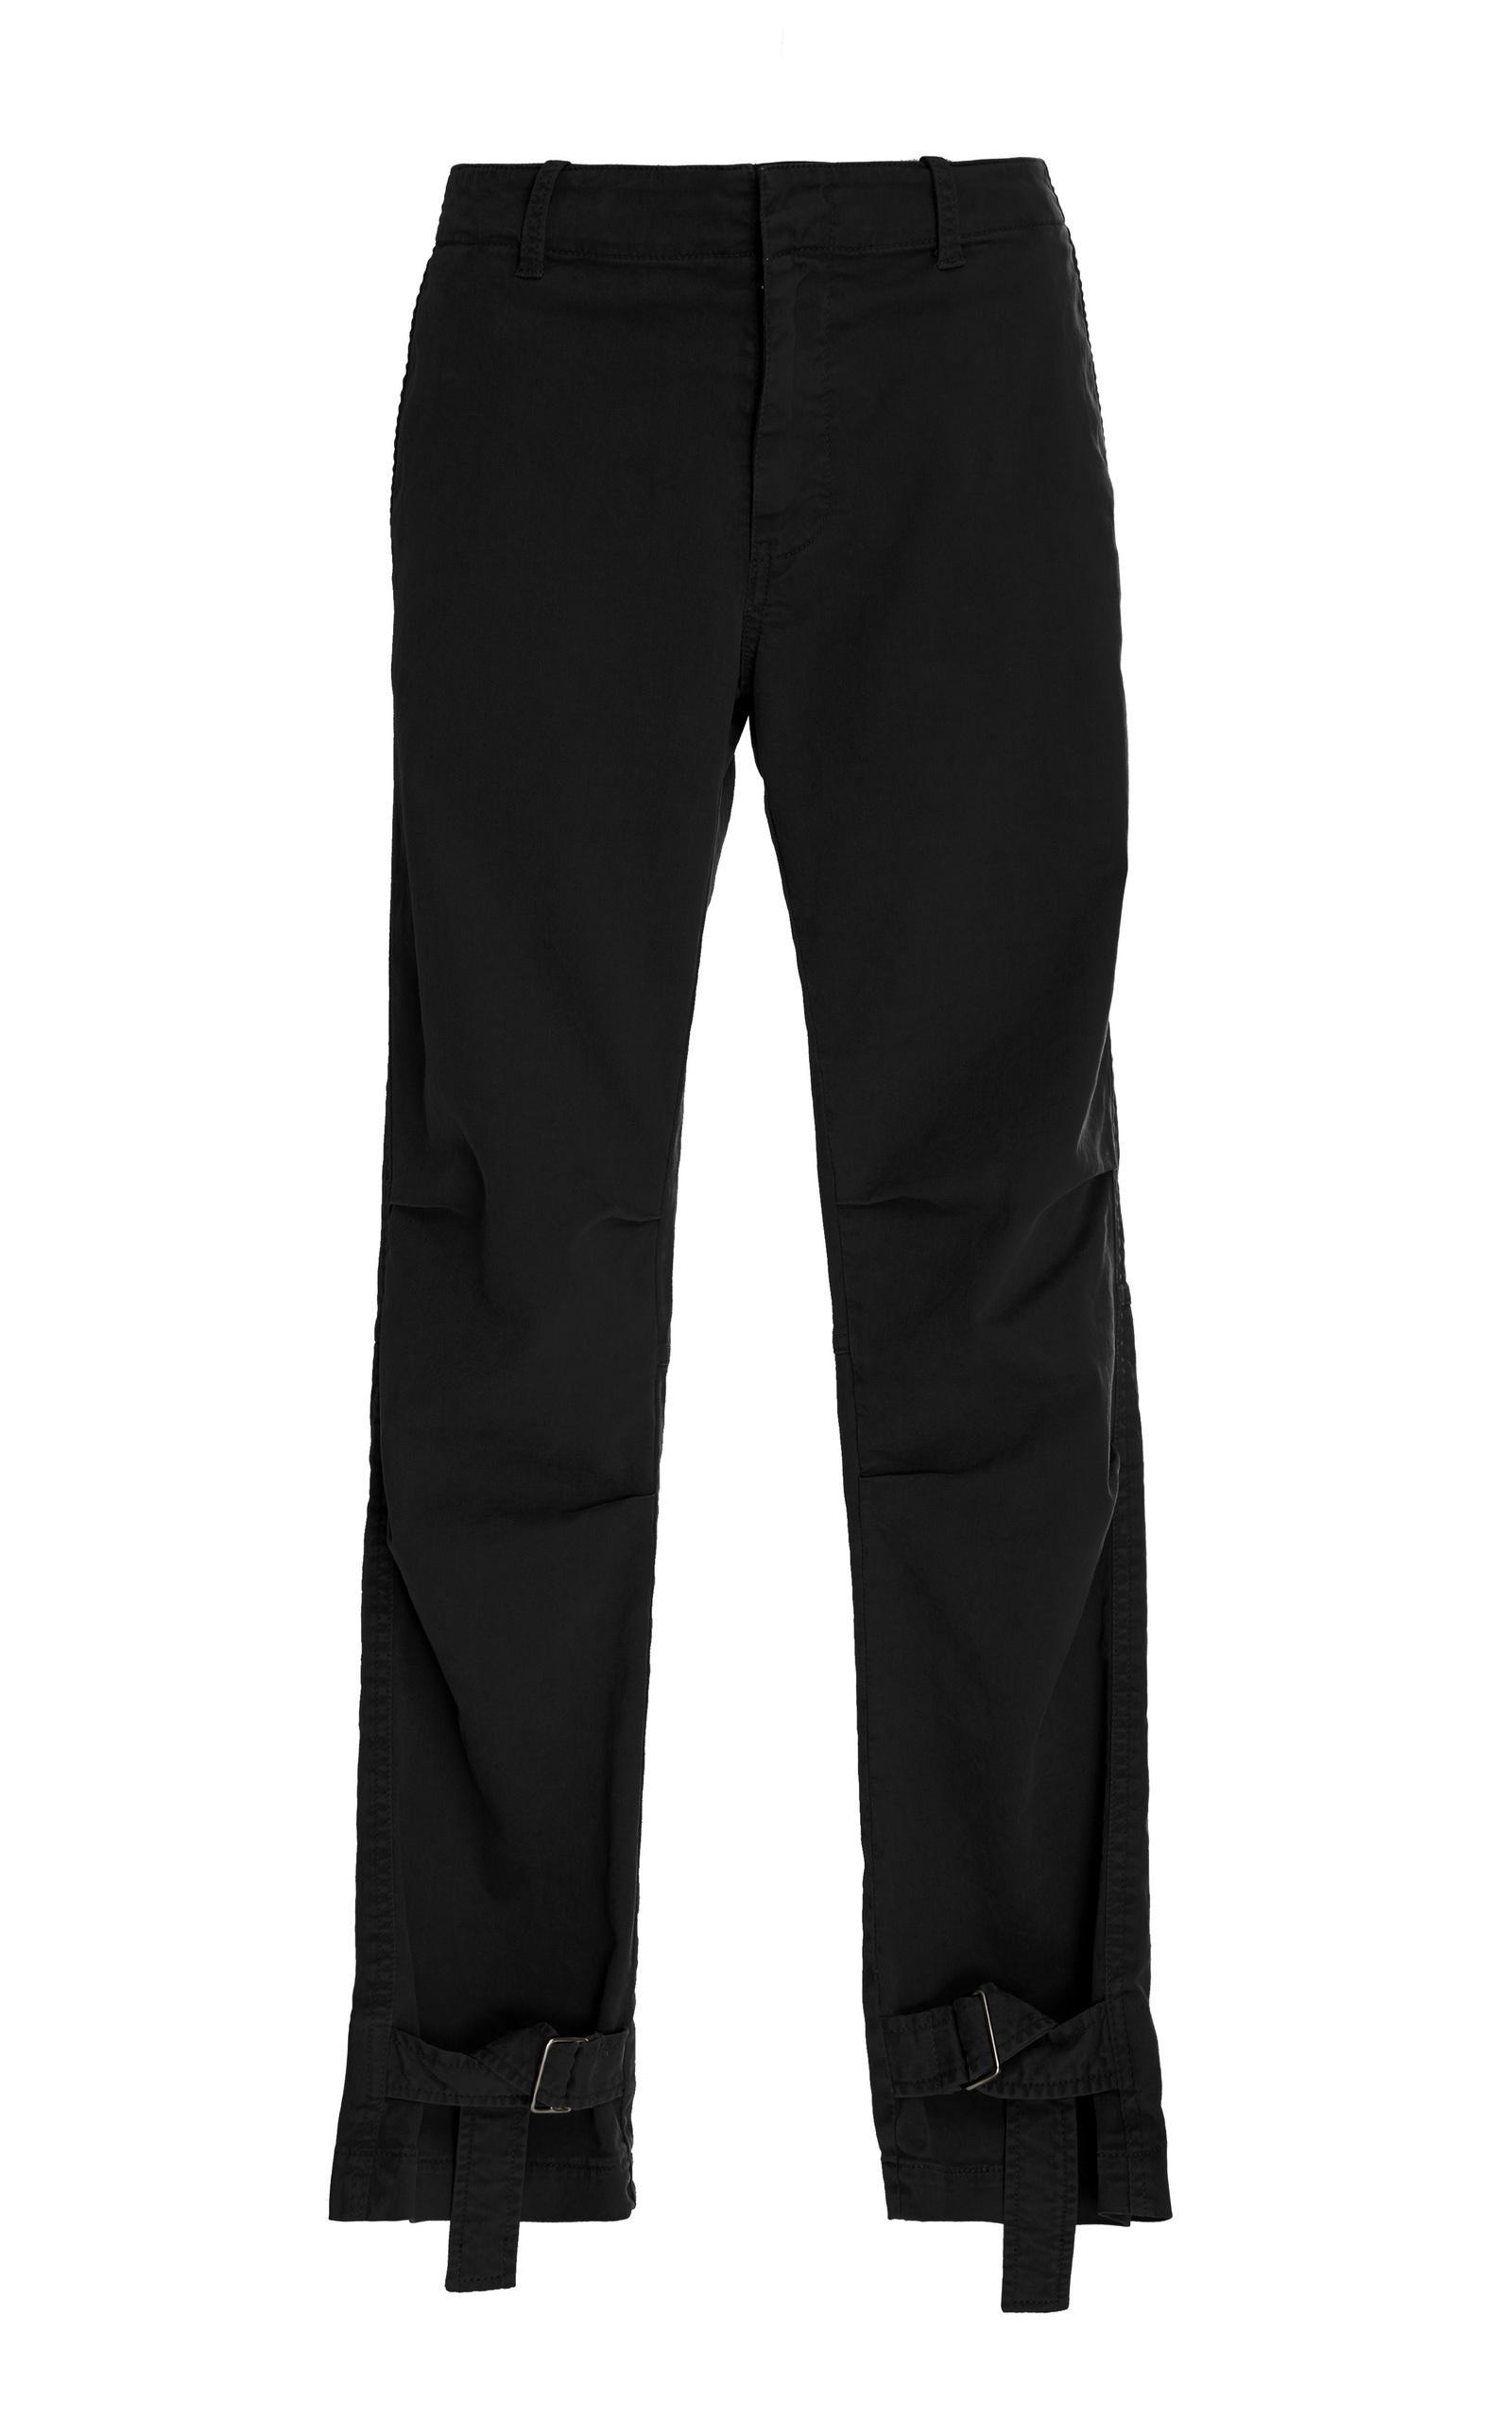 Nili Lotan Bradley Buckle Pant In Black